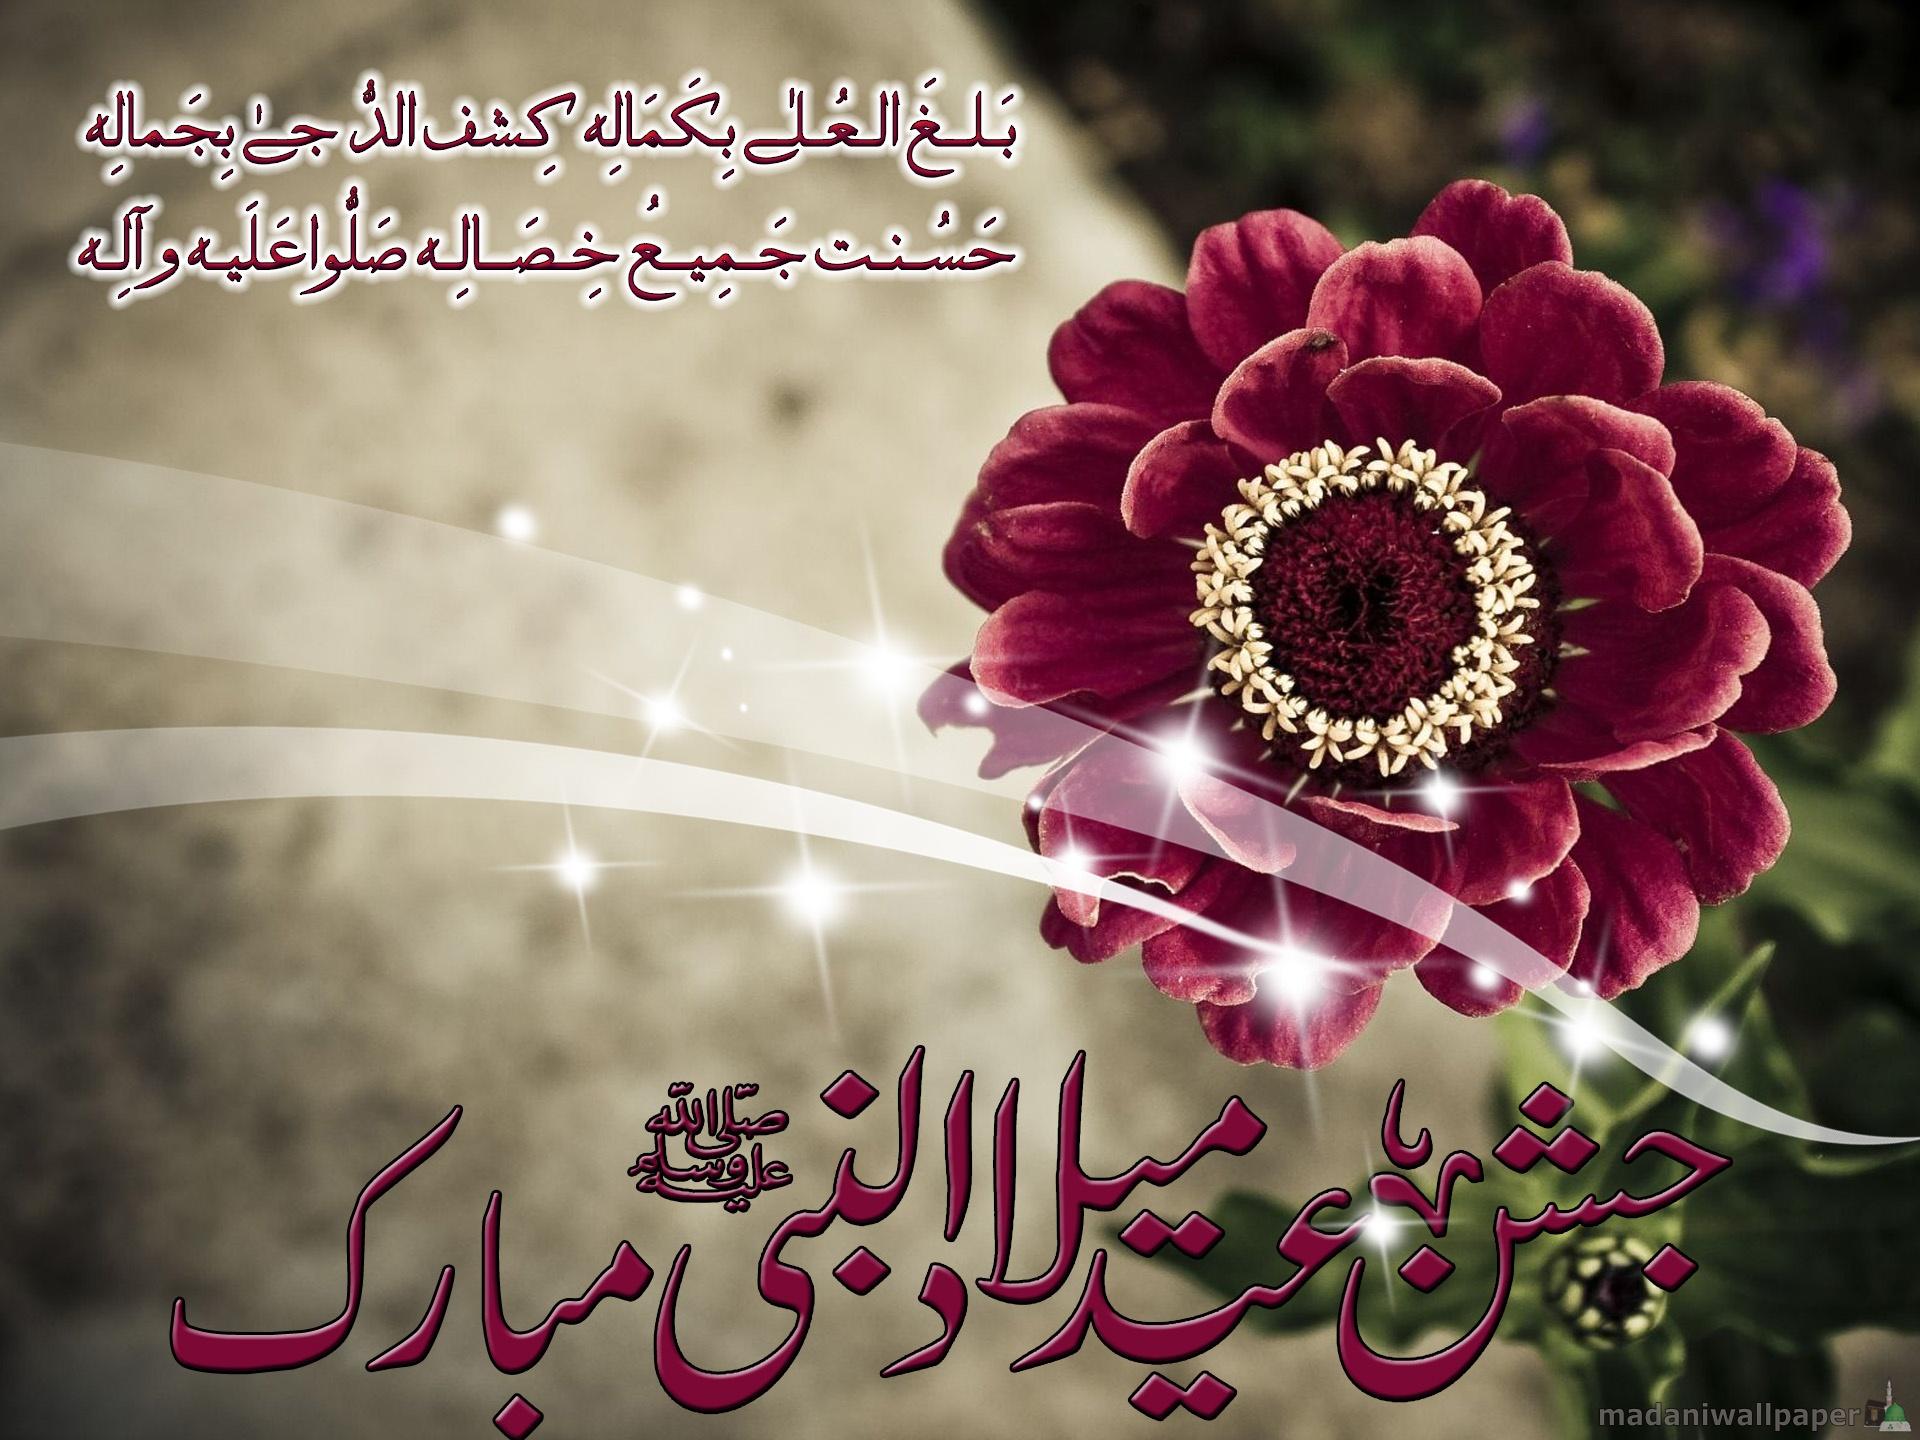 Islam wallpapers pictures images islam wallpaper altavistaventures Images